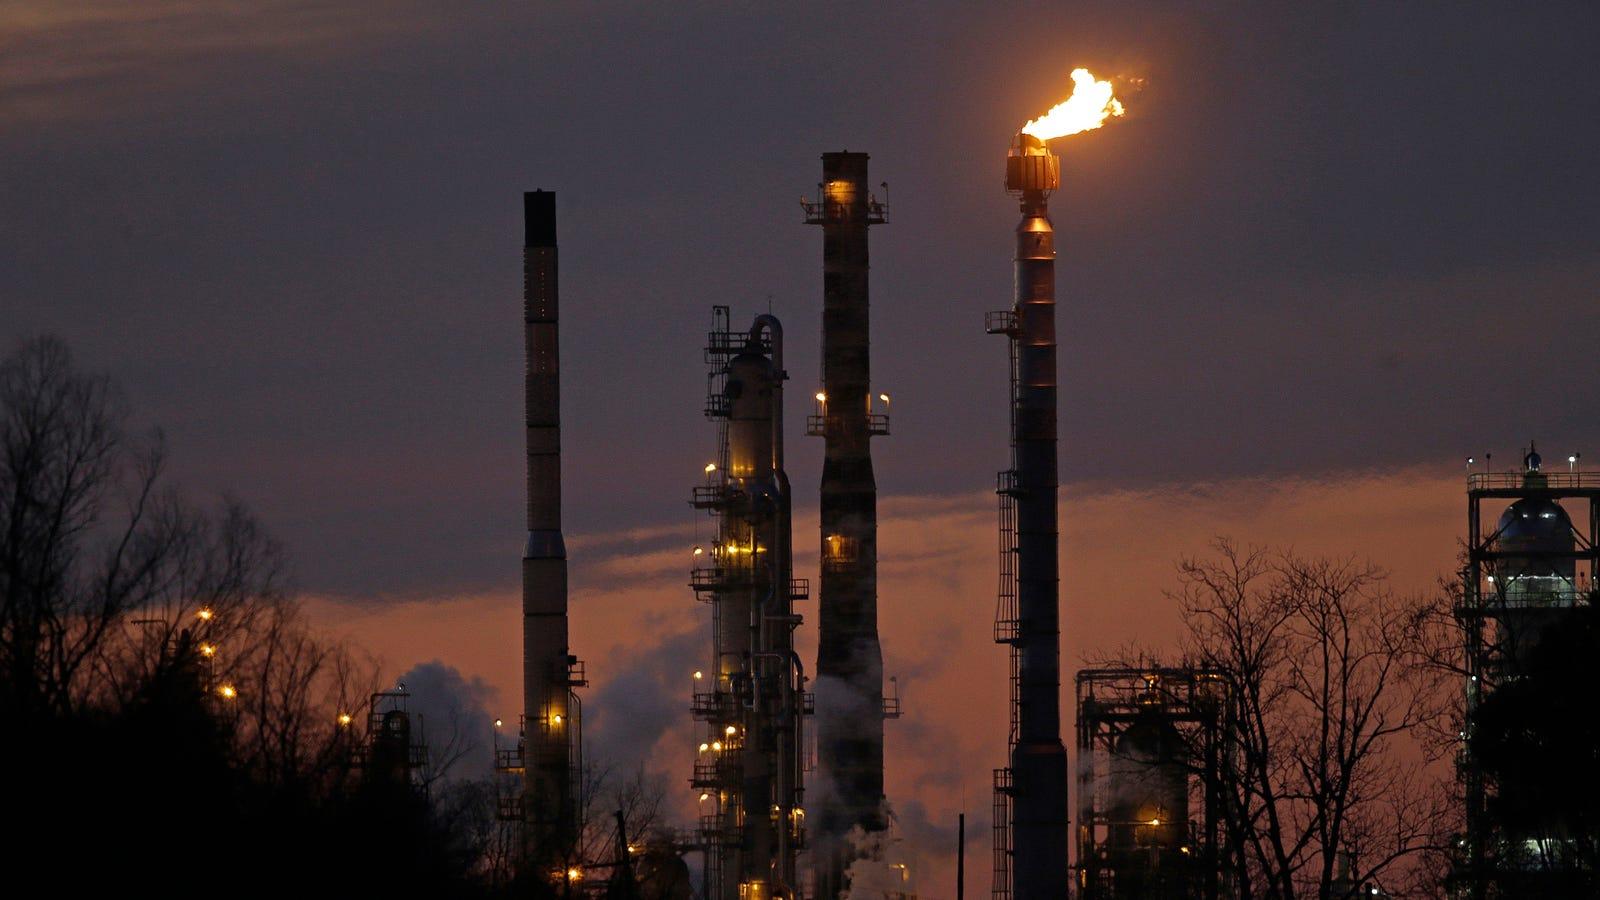 Exxon Predicted 2019's Ominous CO2 Milestone in 1982